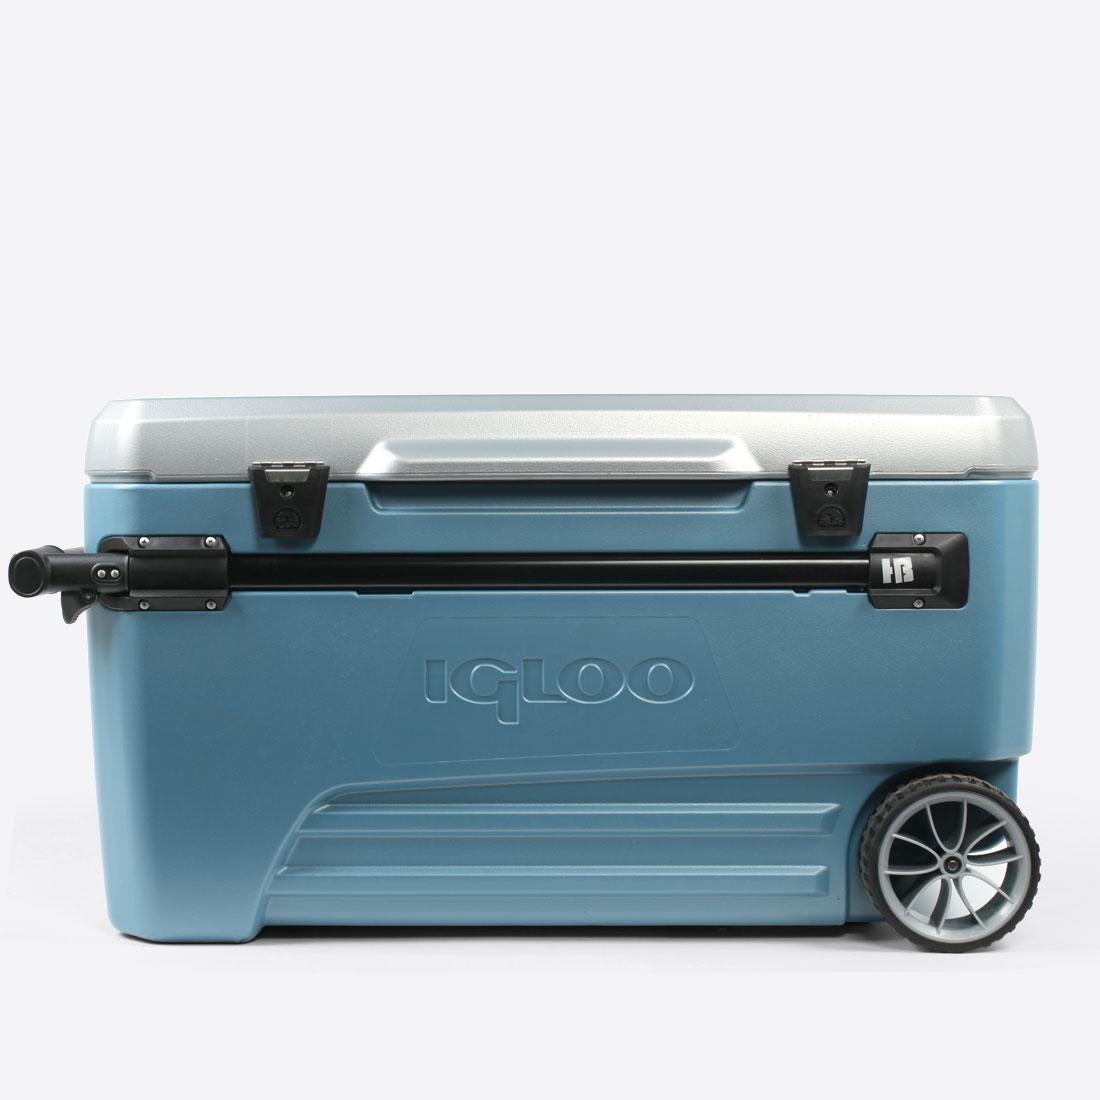 Cooler-Large-20016